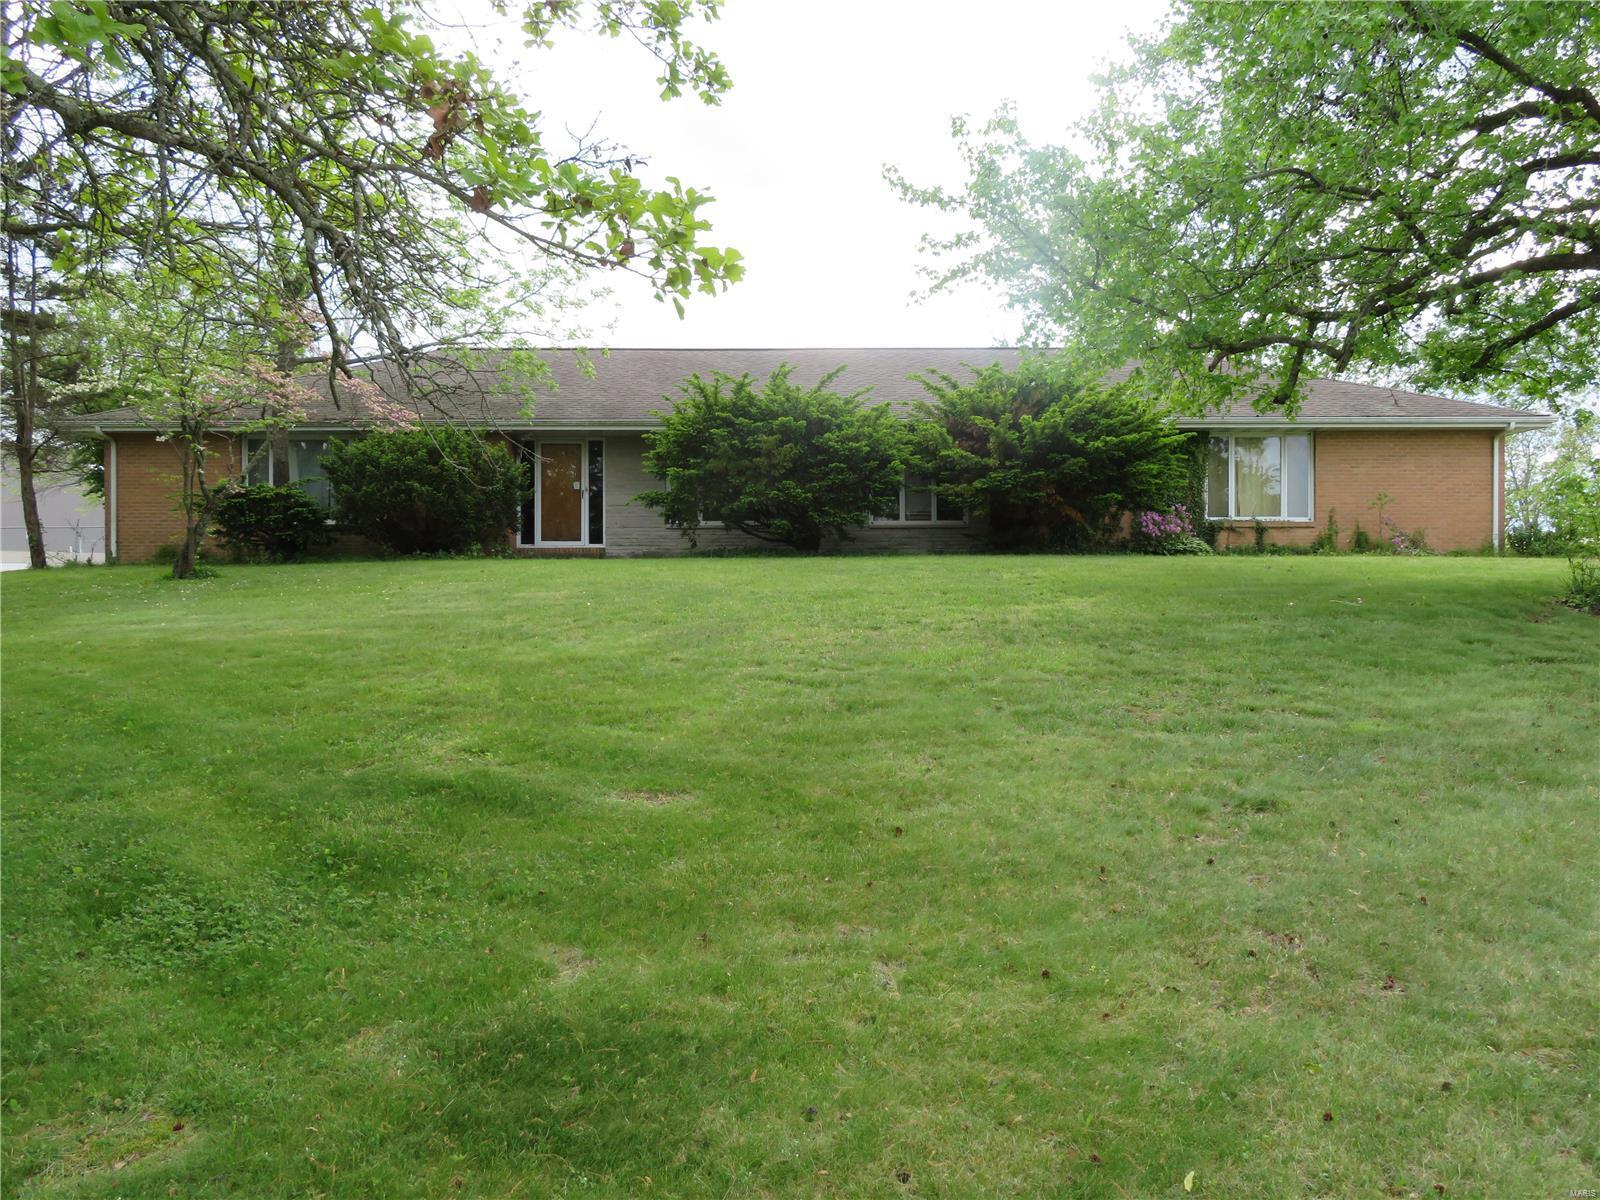 101 East A Property Photo - Dixon, MO real estate listing